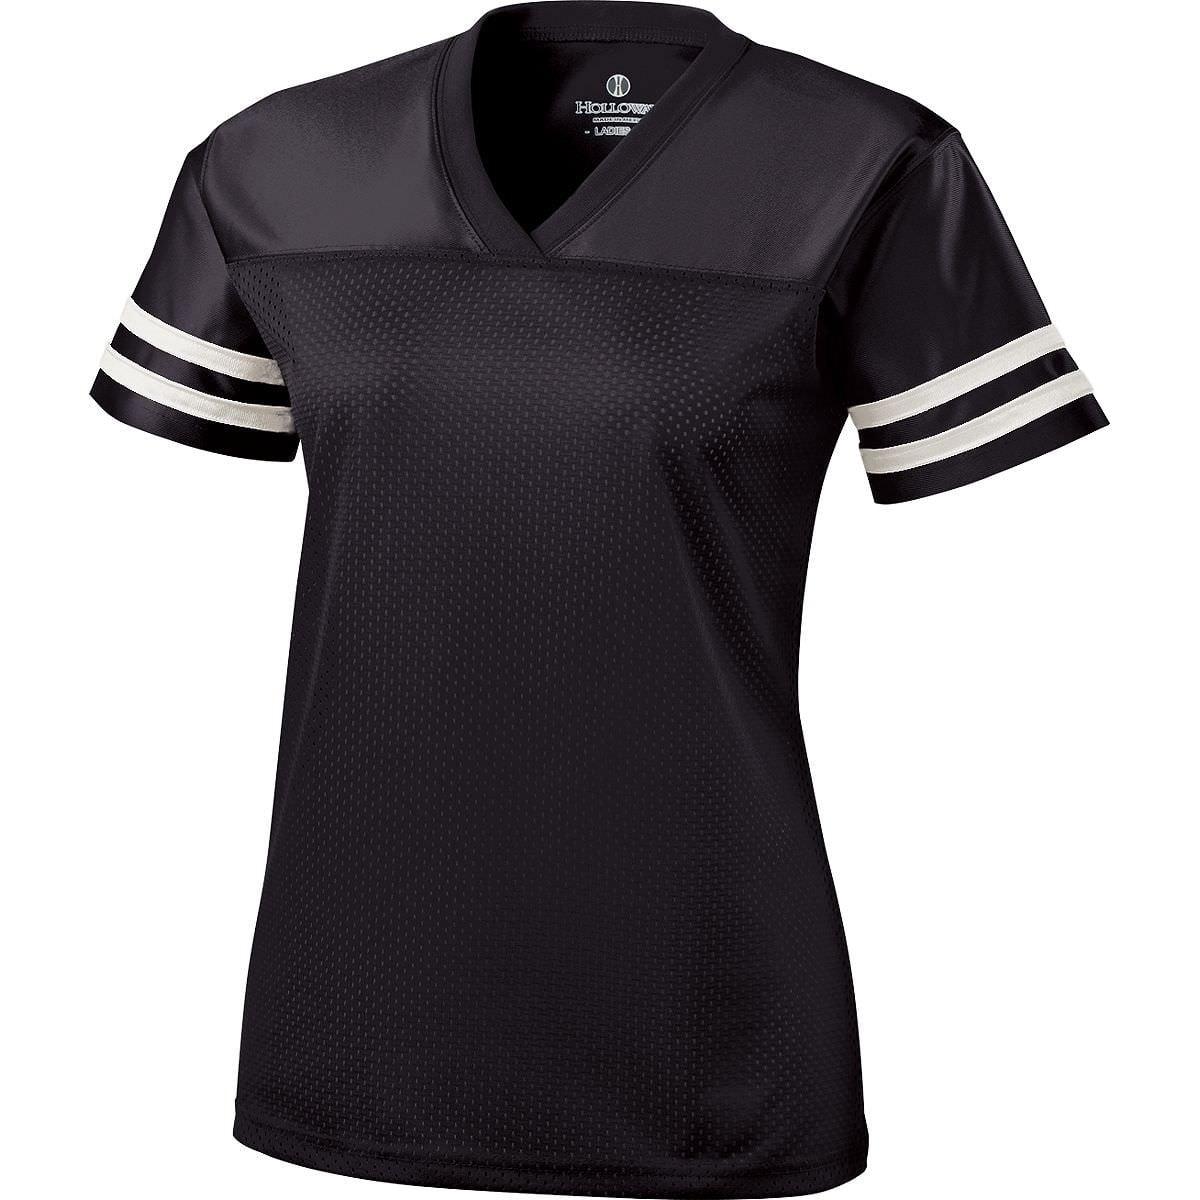 JUNIORS' FAME JERSEY Holloway Sportswear